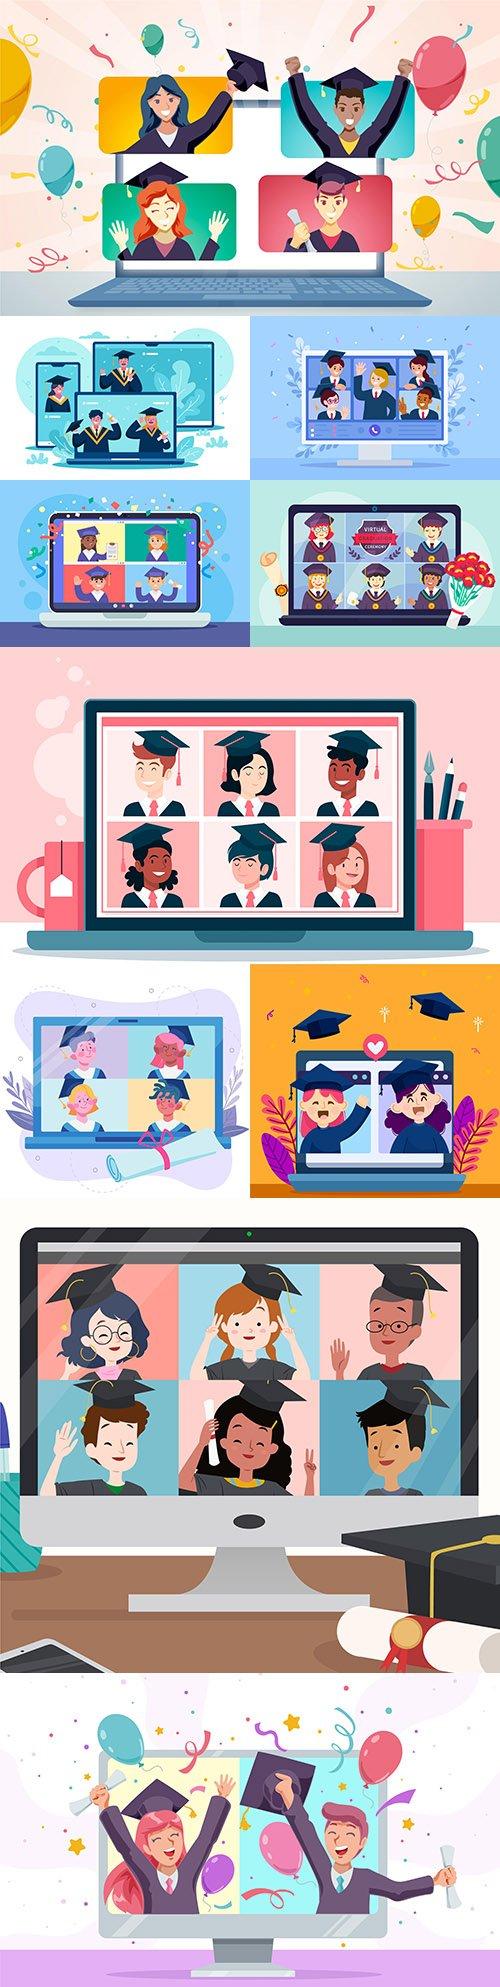 Virtual graduation award ceremony concept illustrations